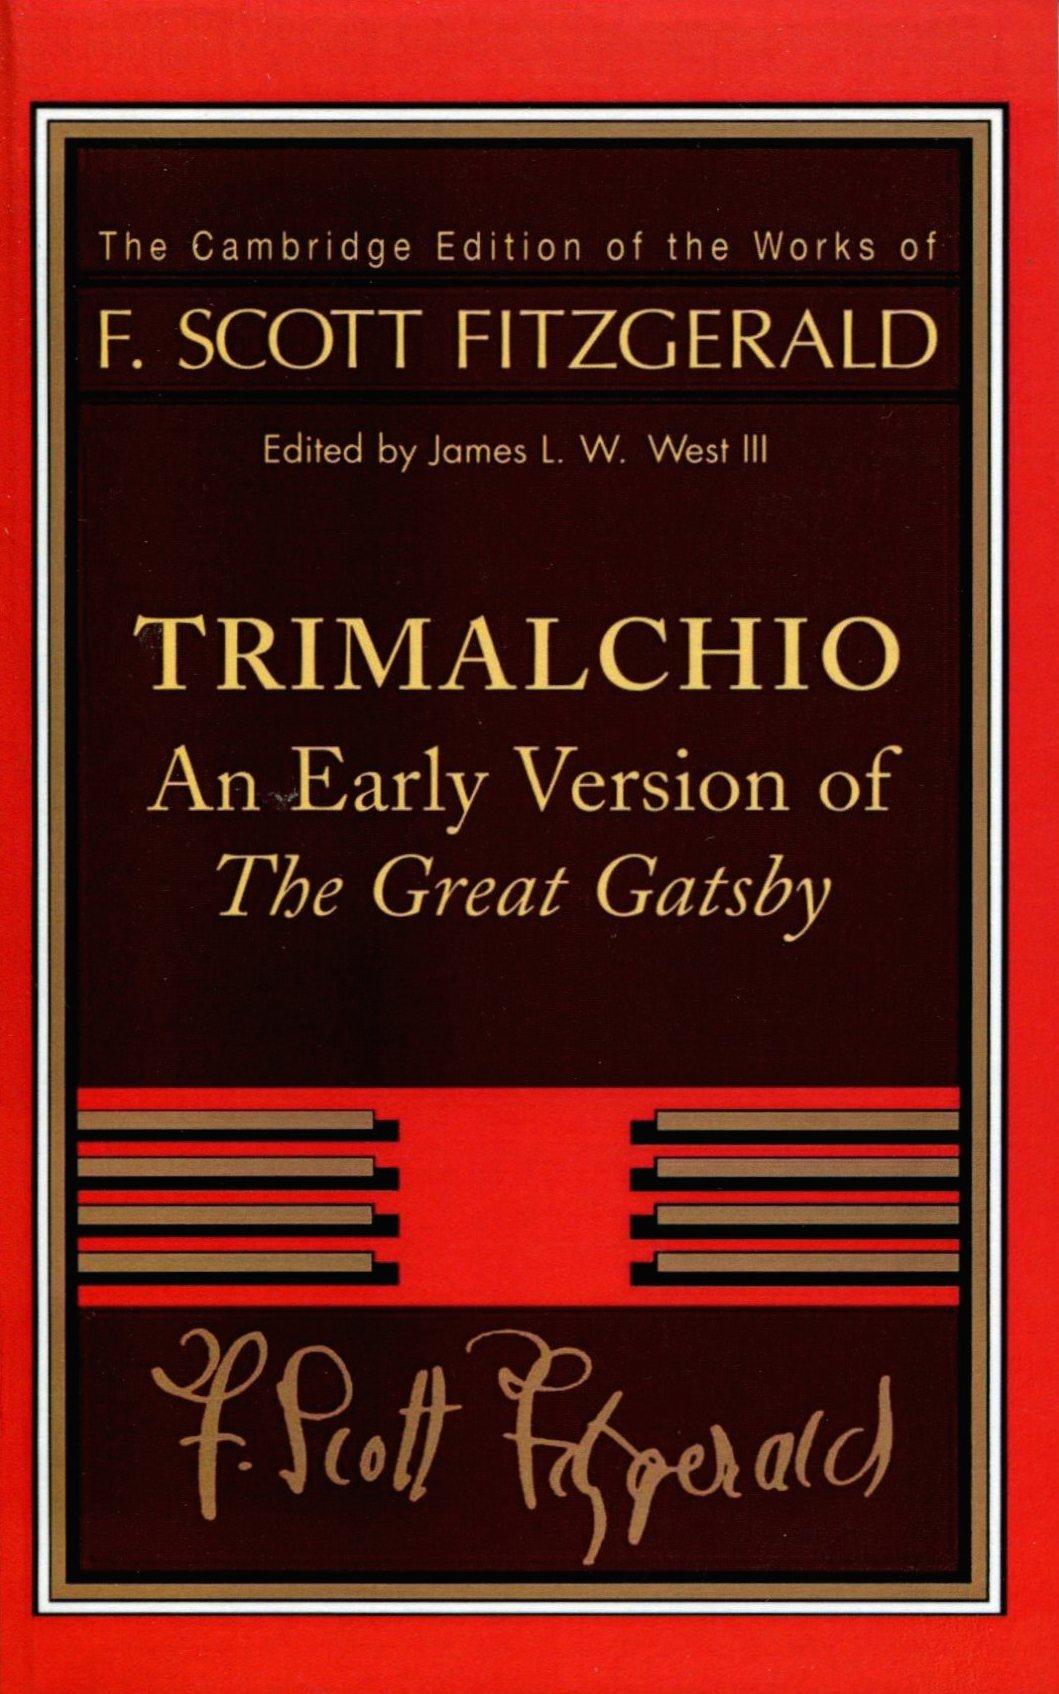 the great gatsby literary criticism essay great gatsby essays on the american dream boisson